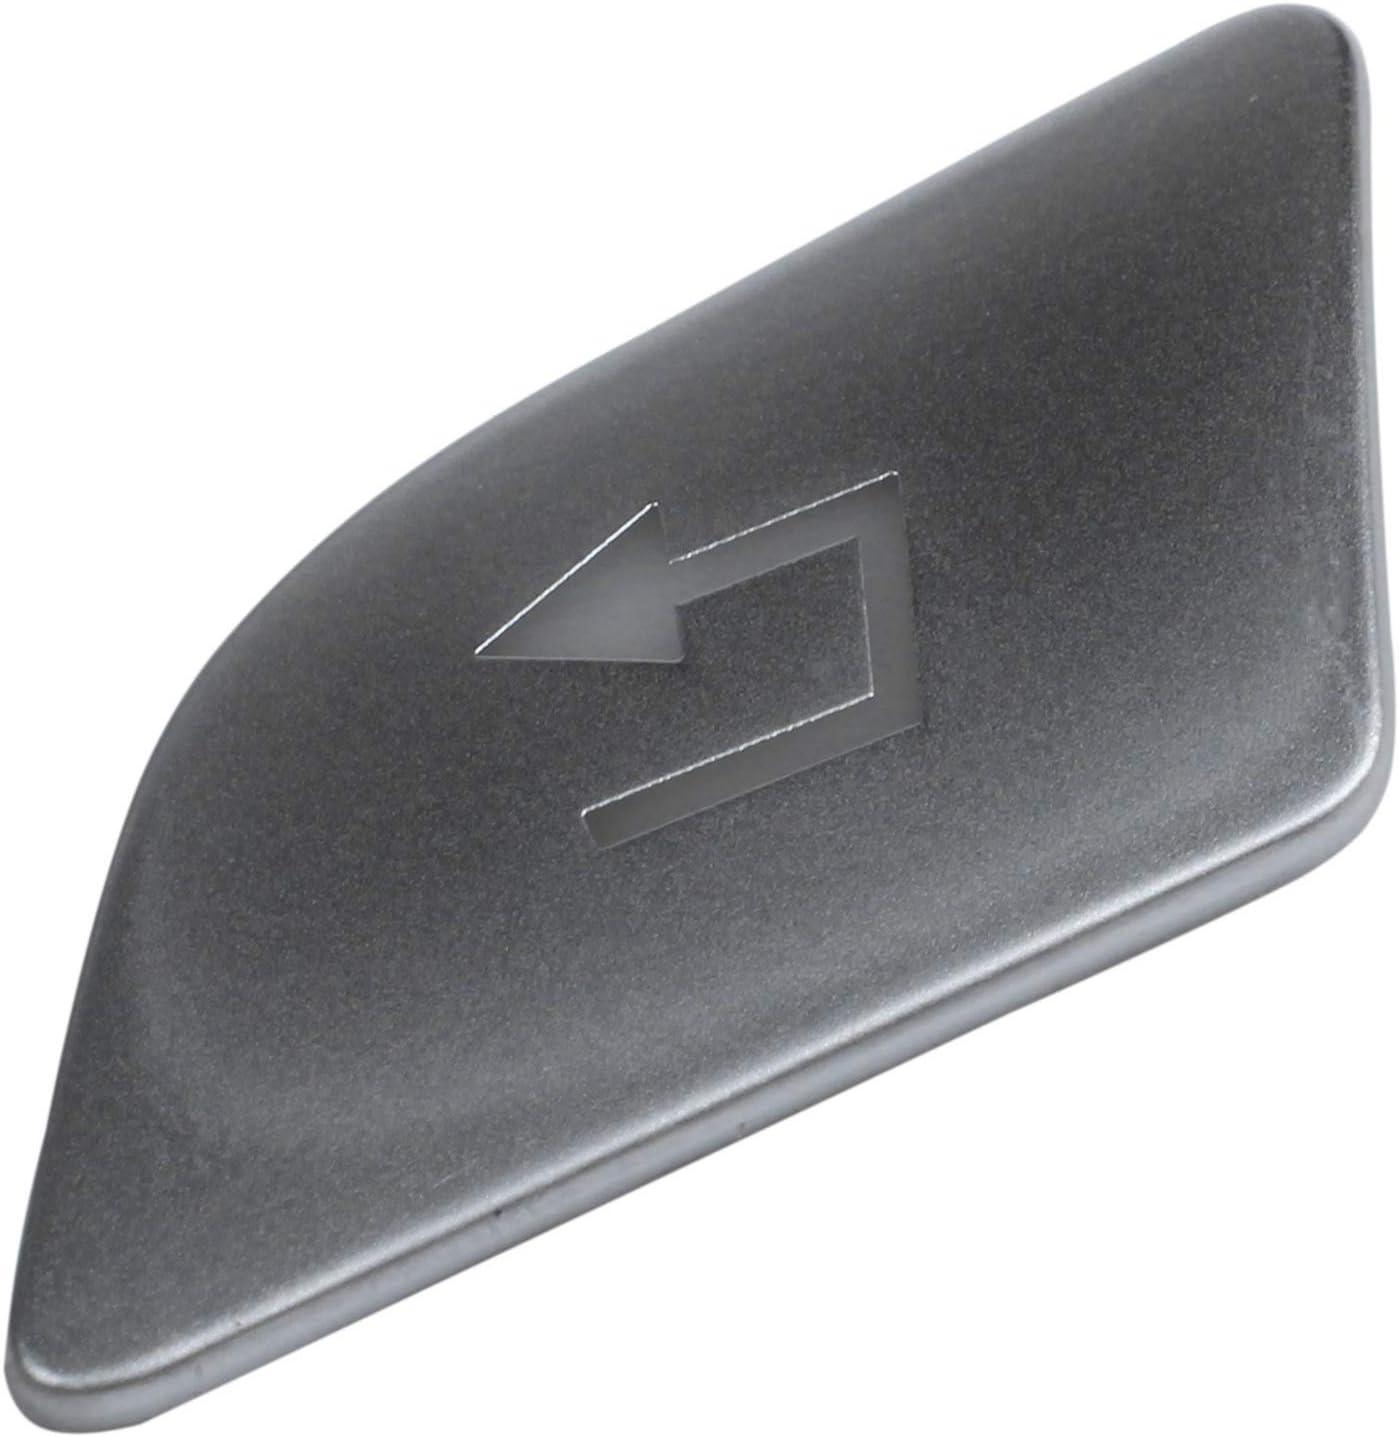 DaysAgo Pegatina De Cubierta De Recorte De Interruptor De Bot/ón De Volante para Mercedes A B C E Ml GL Cla Gla Glk SL SLK Class W176 W246 W212 W204